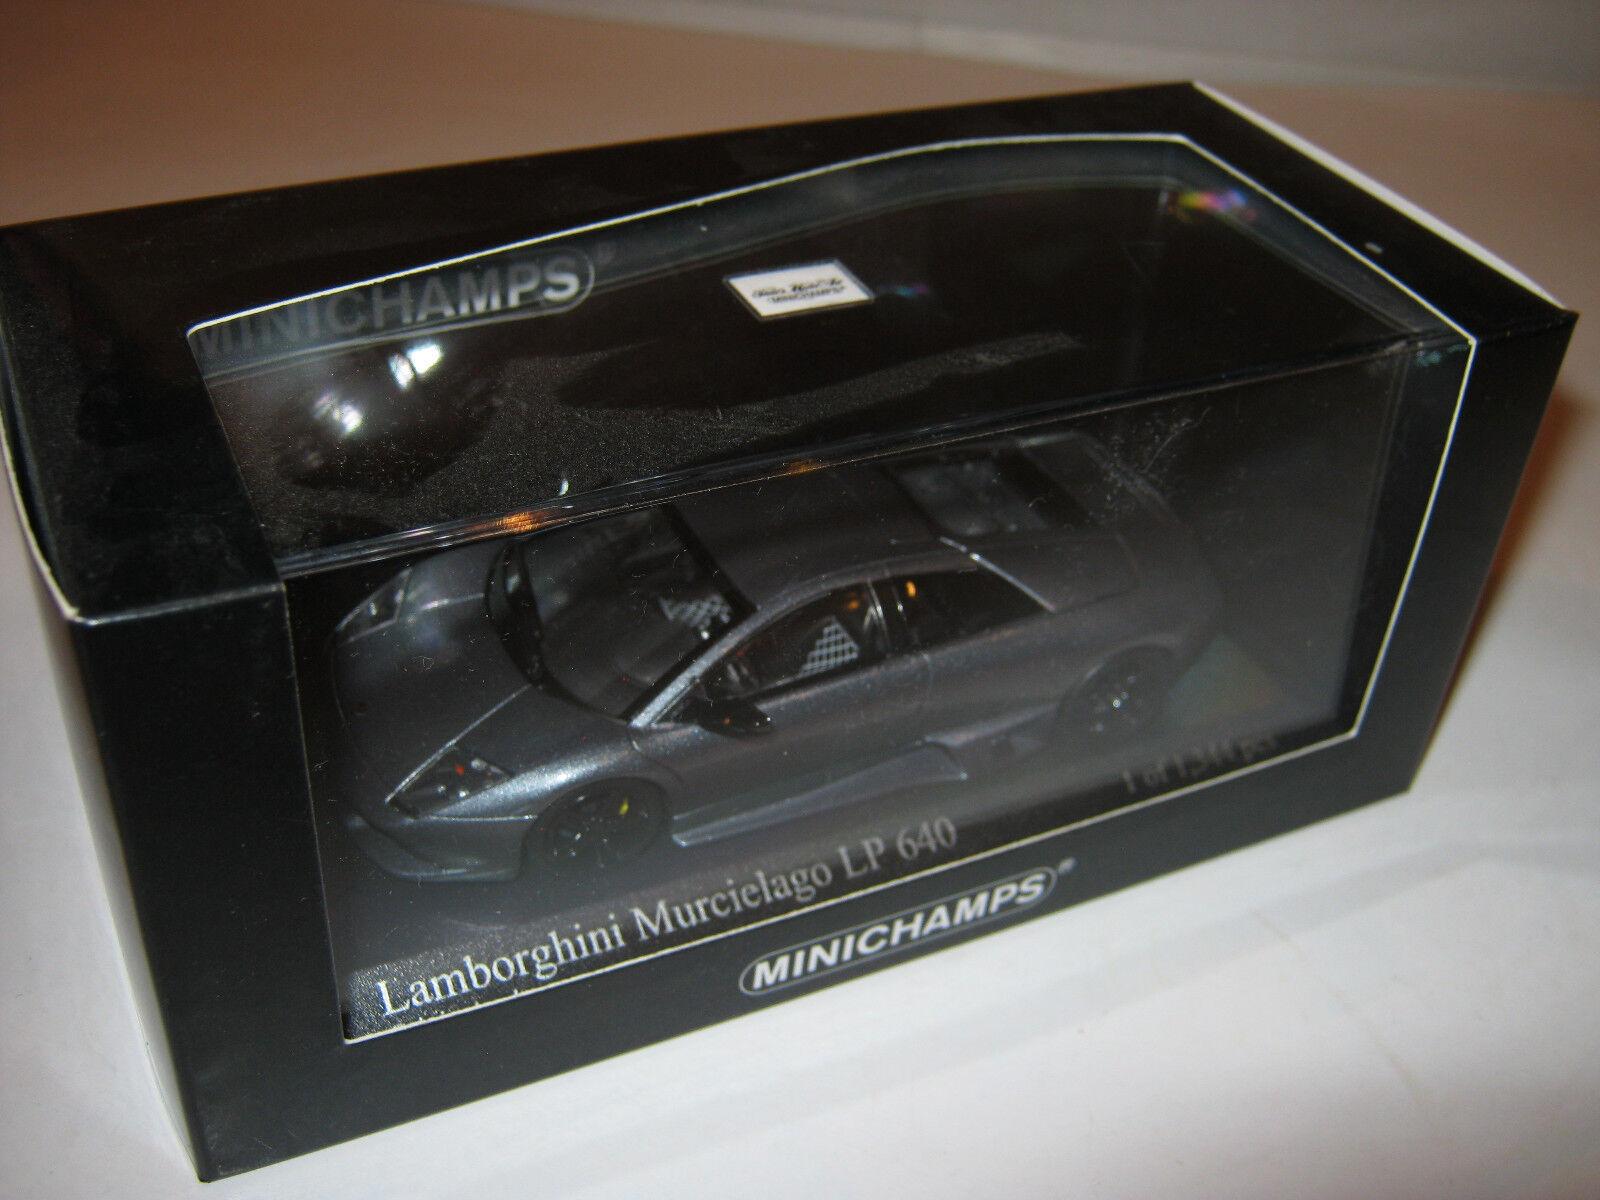 1 43 Lamborghini Murcielago LP640 LP640 LP640 greymet 2006 L.E. MINICHAMPS 400103920 OVP new 1a4080